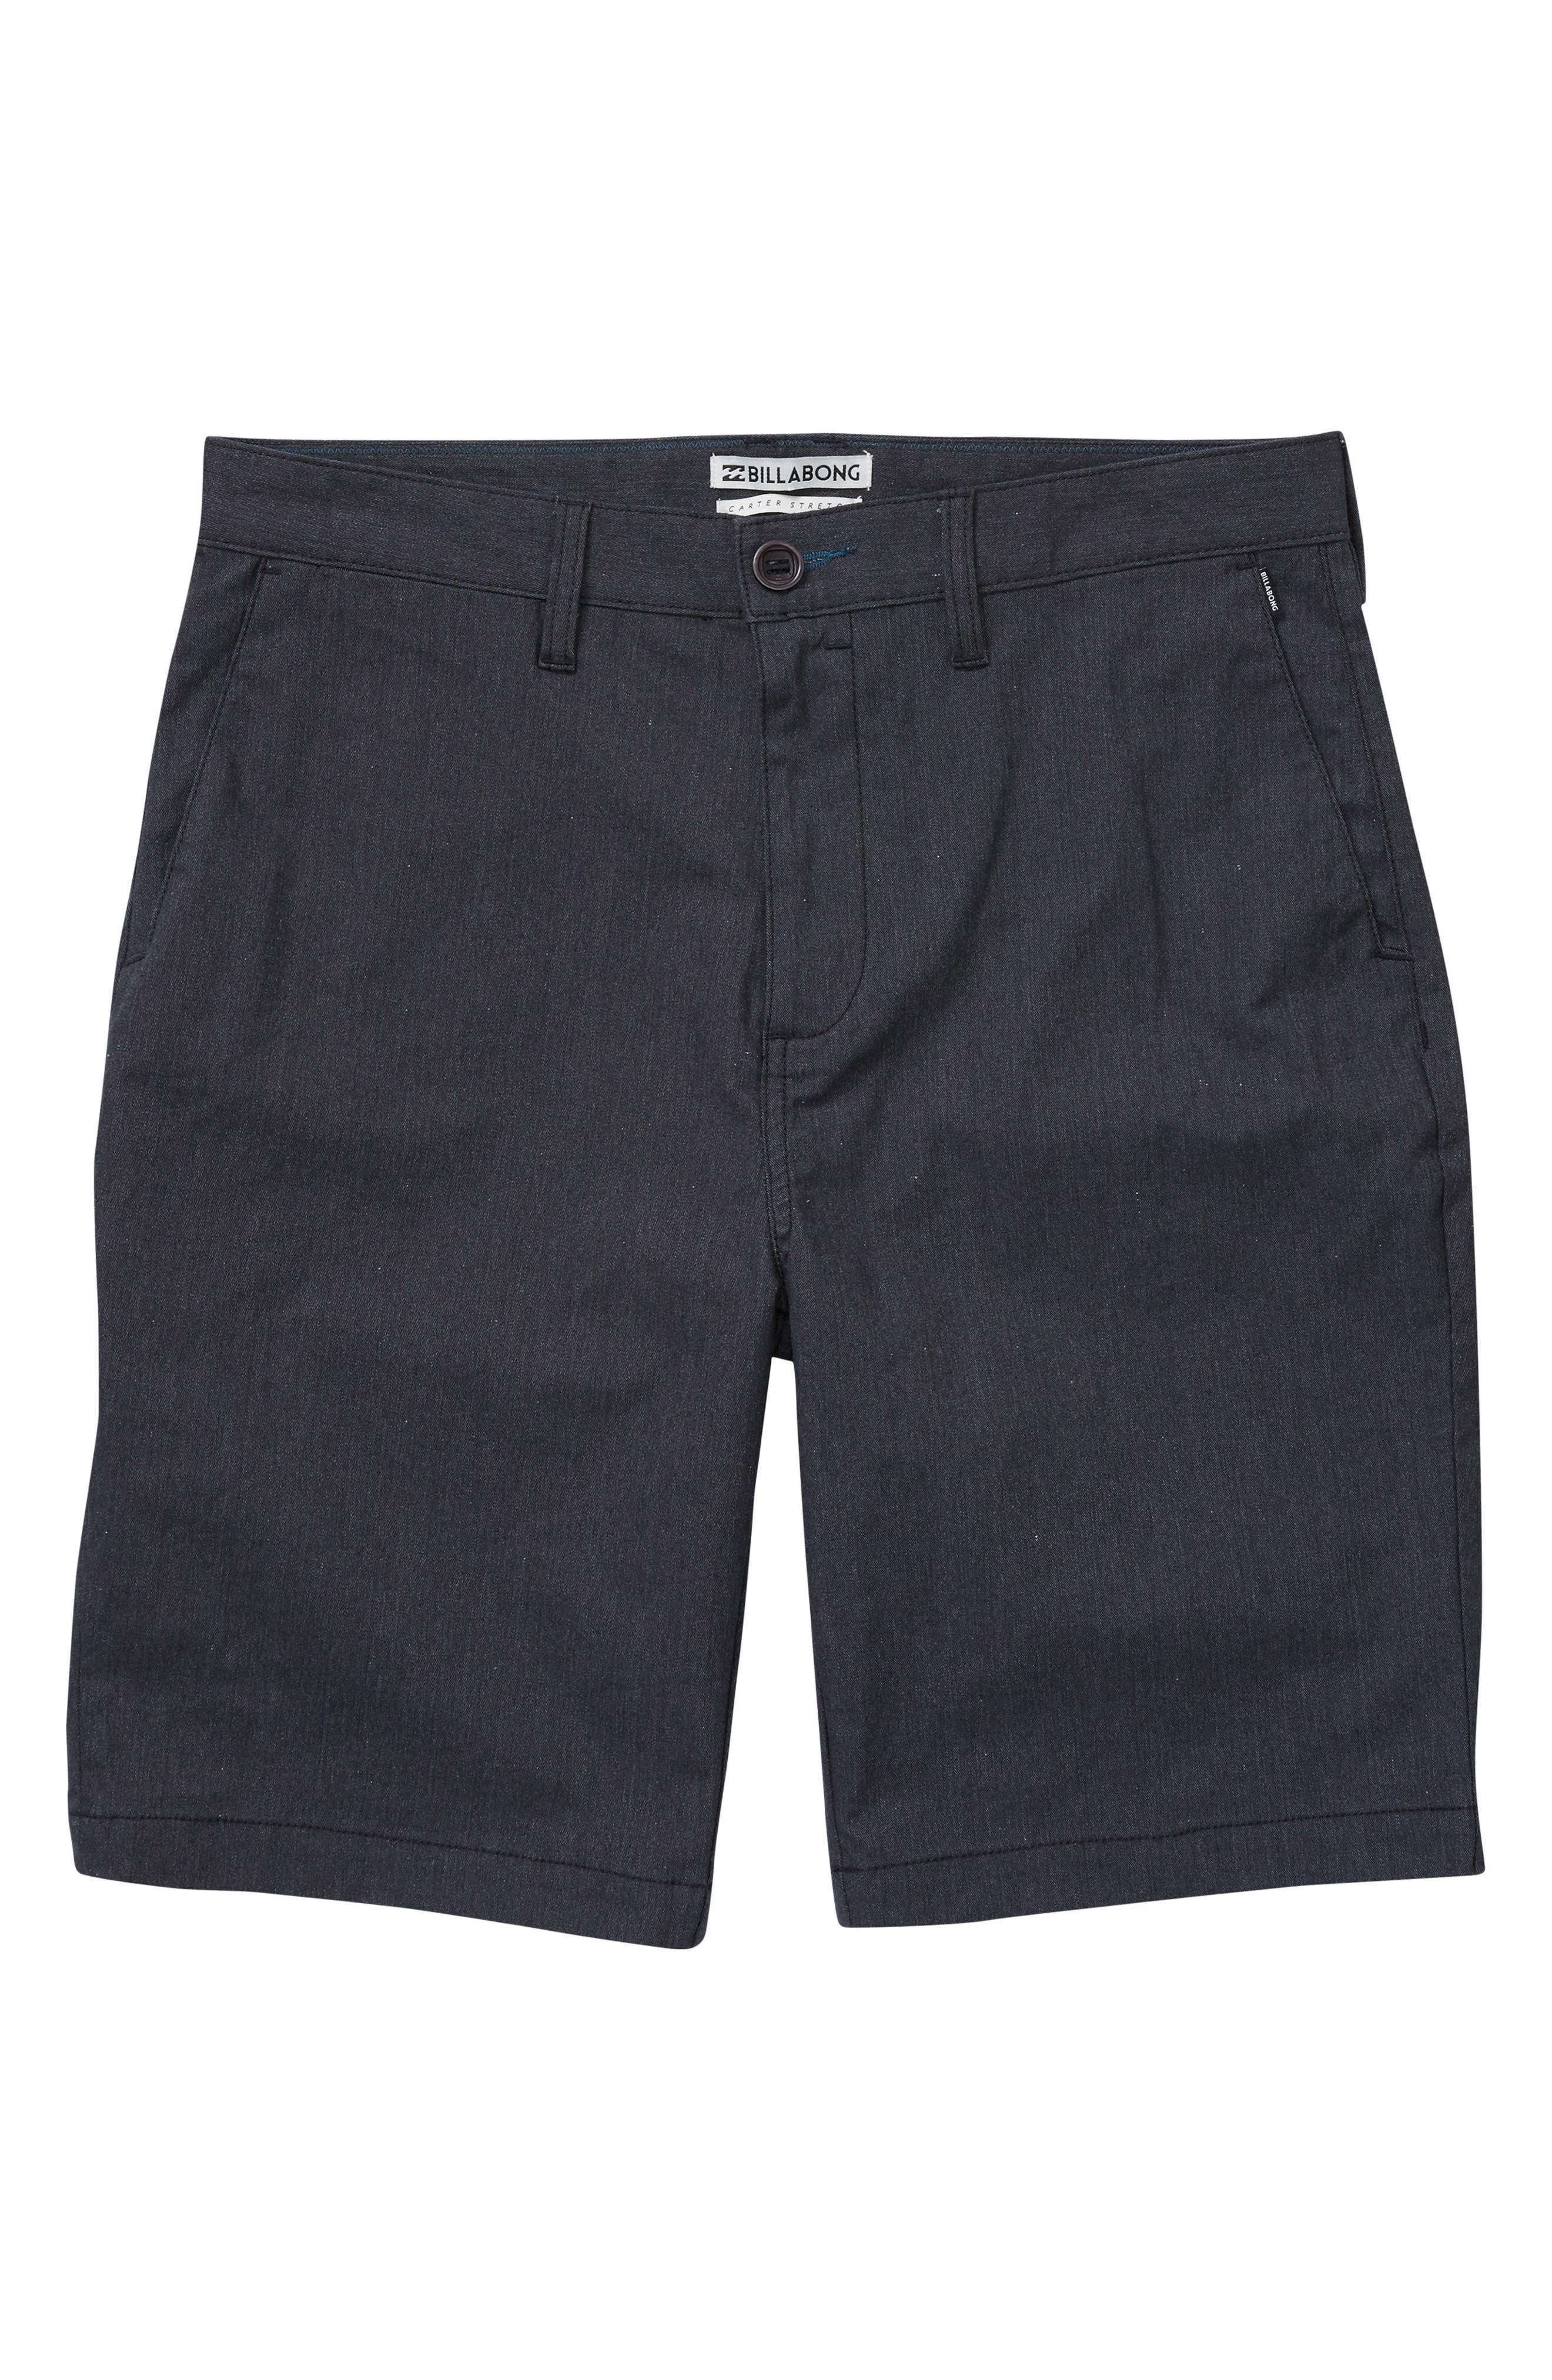 Carter Stretch Shorts,                             Main thumbnail 1, color,                             001